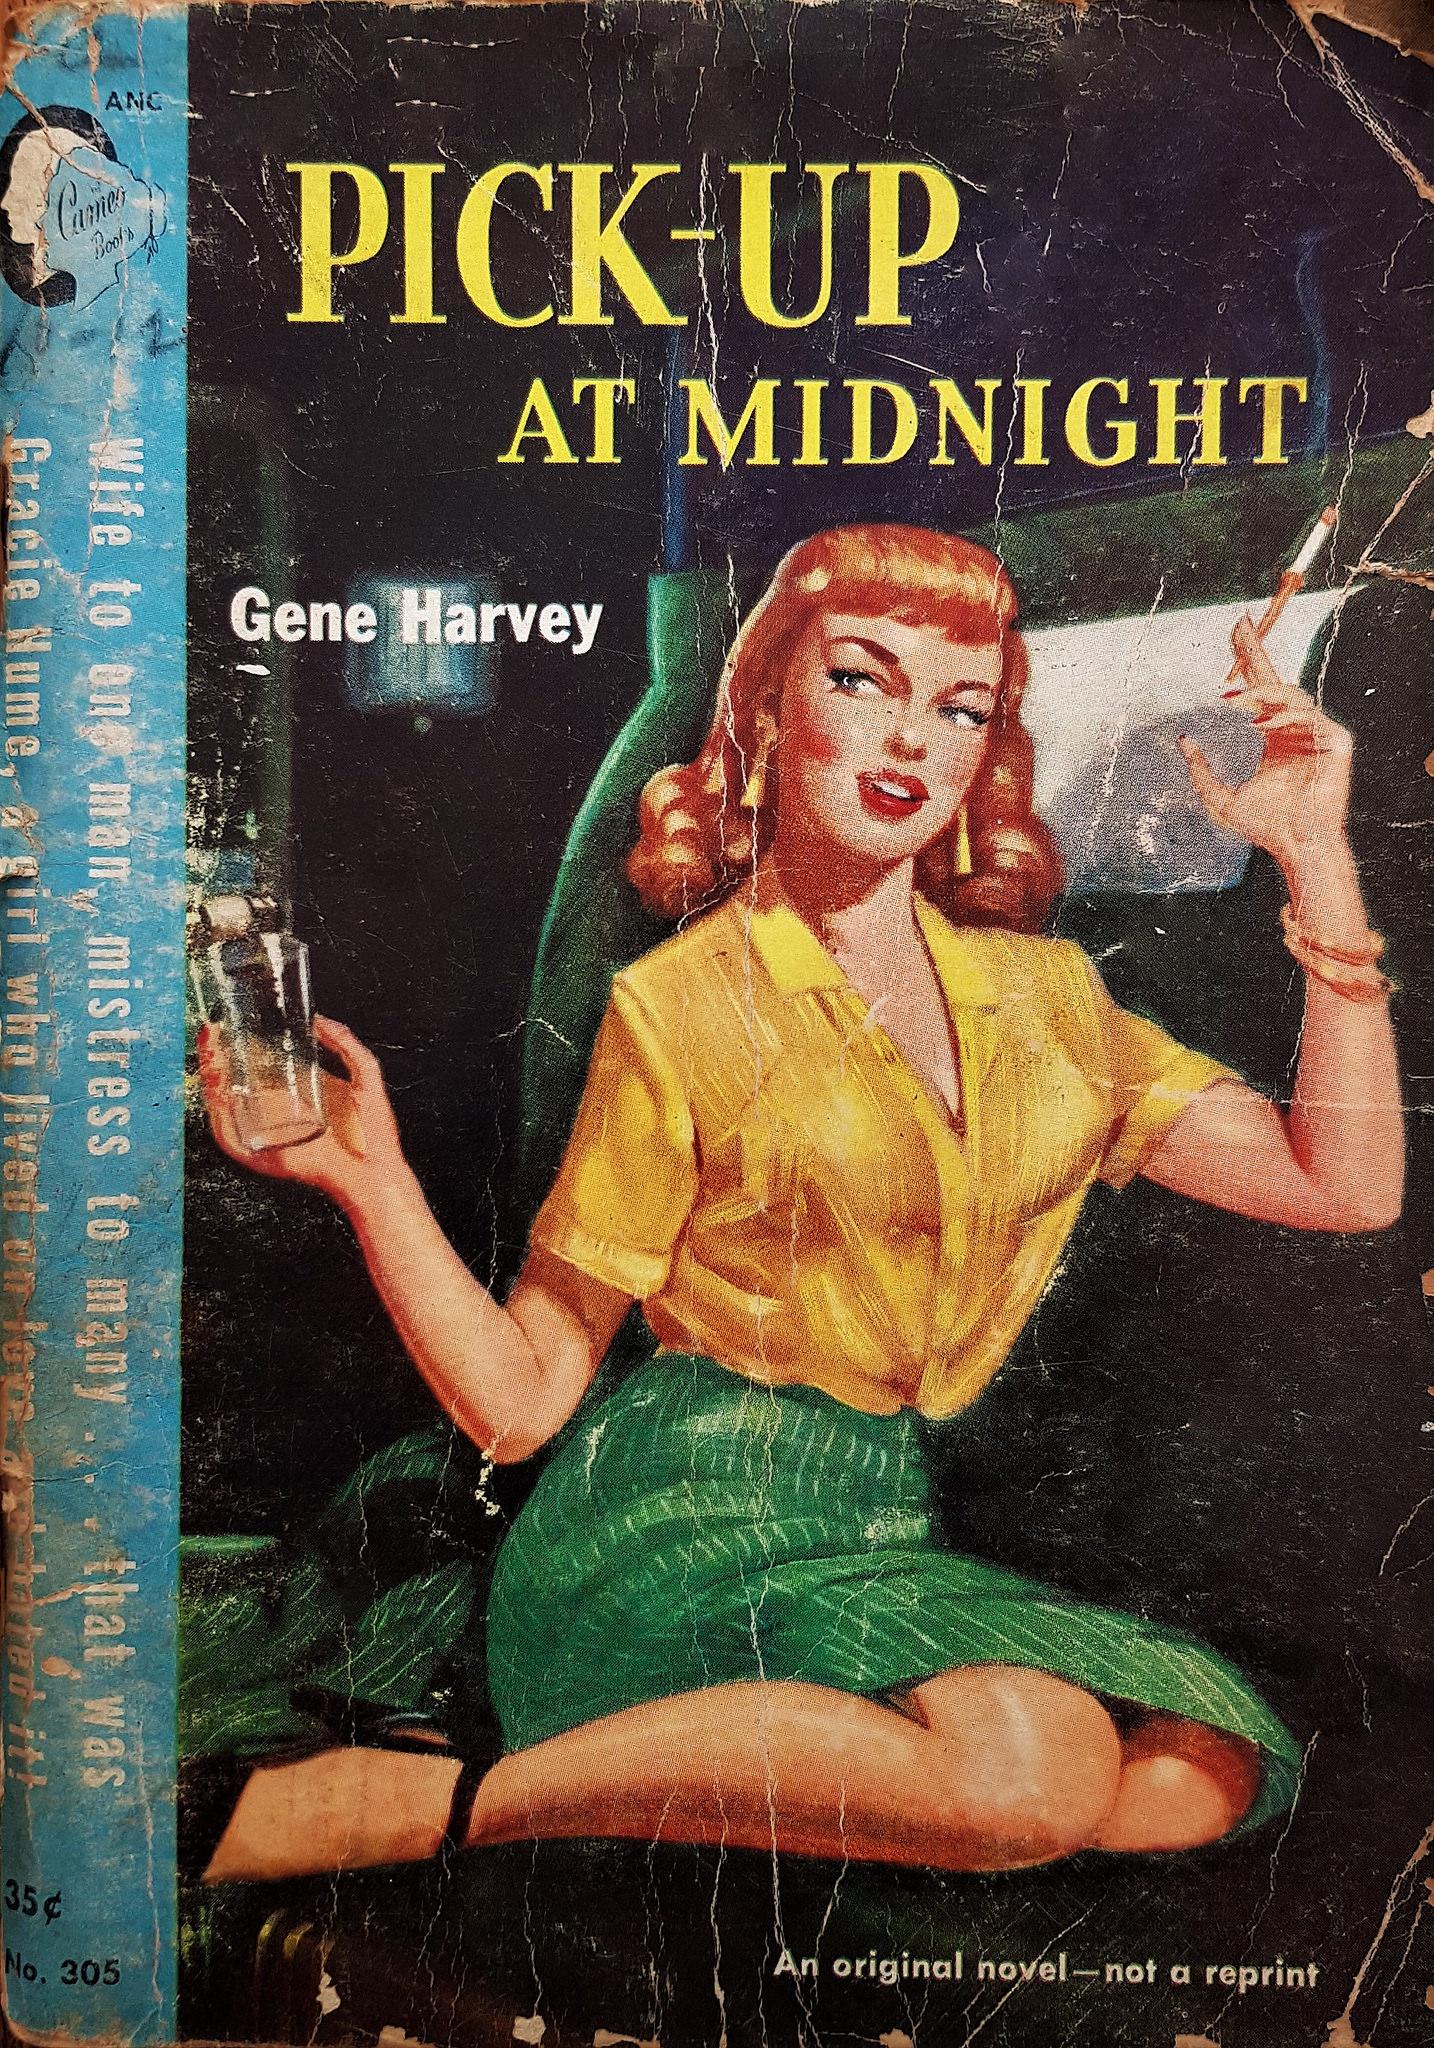 04 Vintage Pulp Art Something About Midnight Magazine